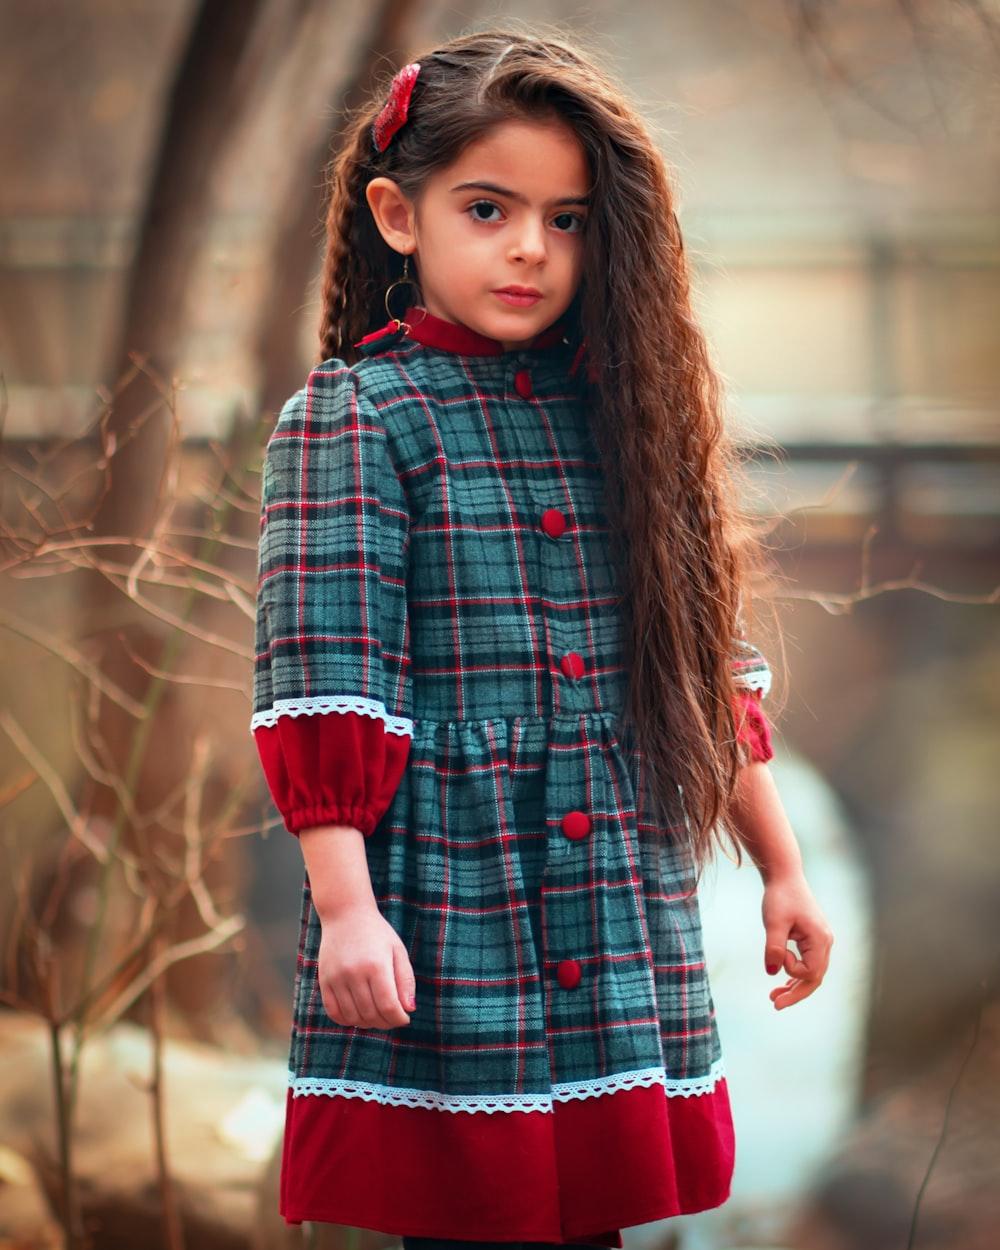 girl standing near tree